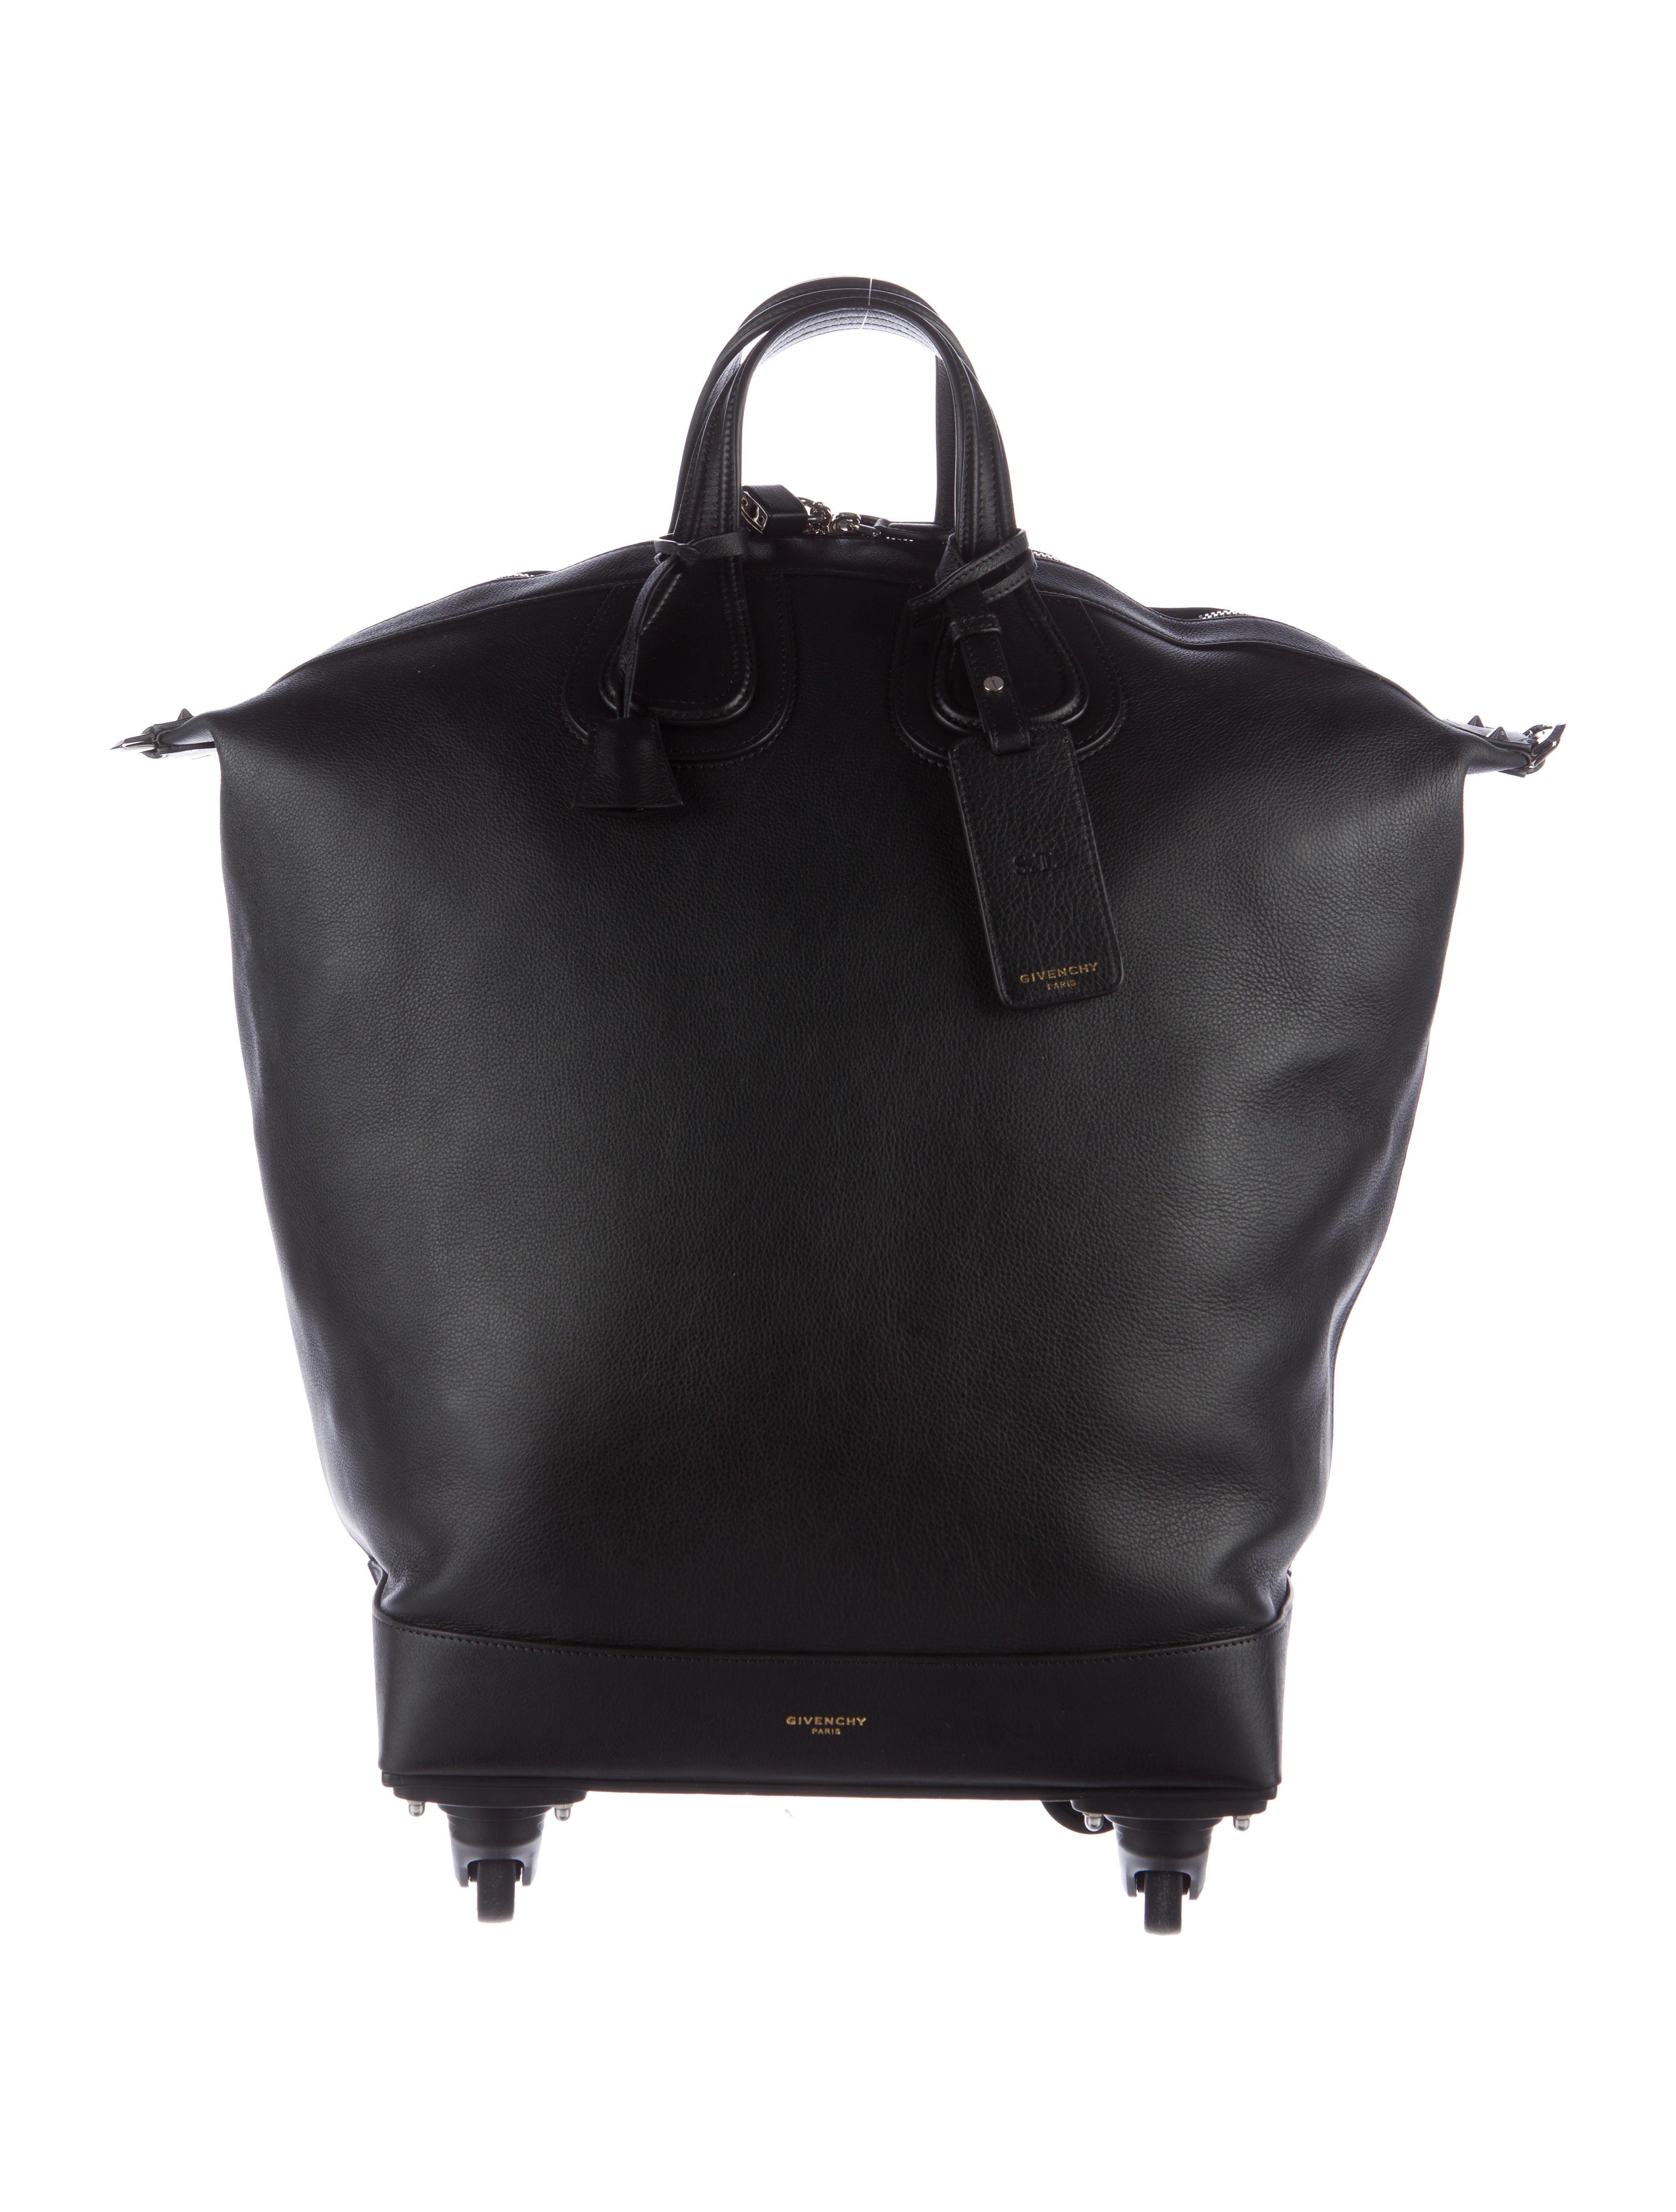 0bad99de93c1 Givenchy Nightingale Trolley Bag - Luggage - GIV38696